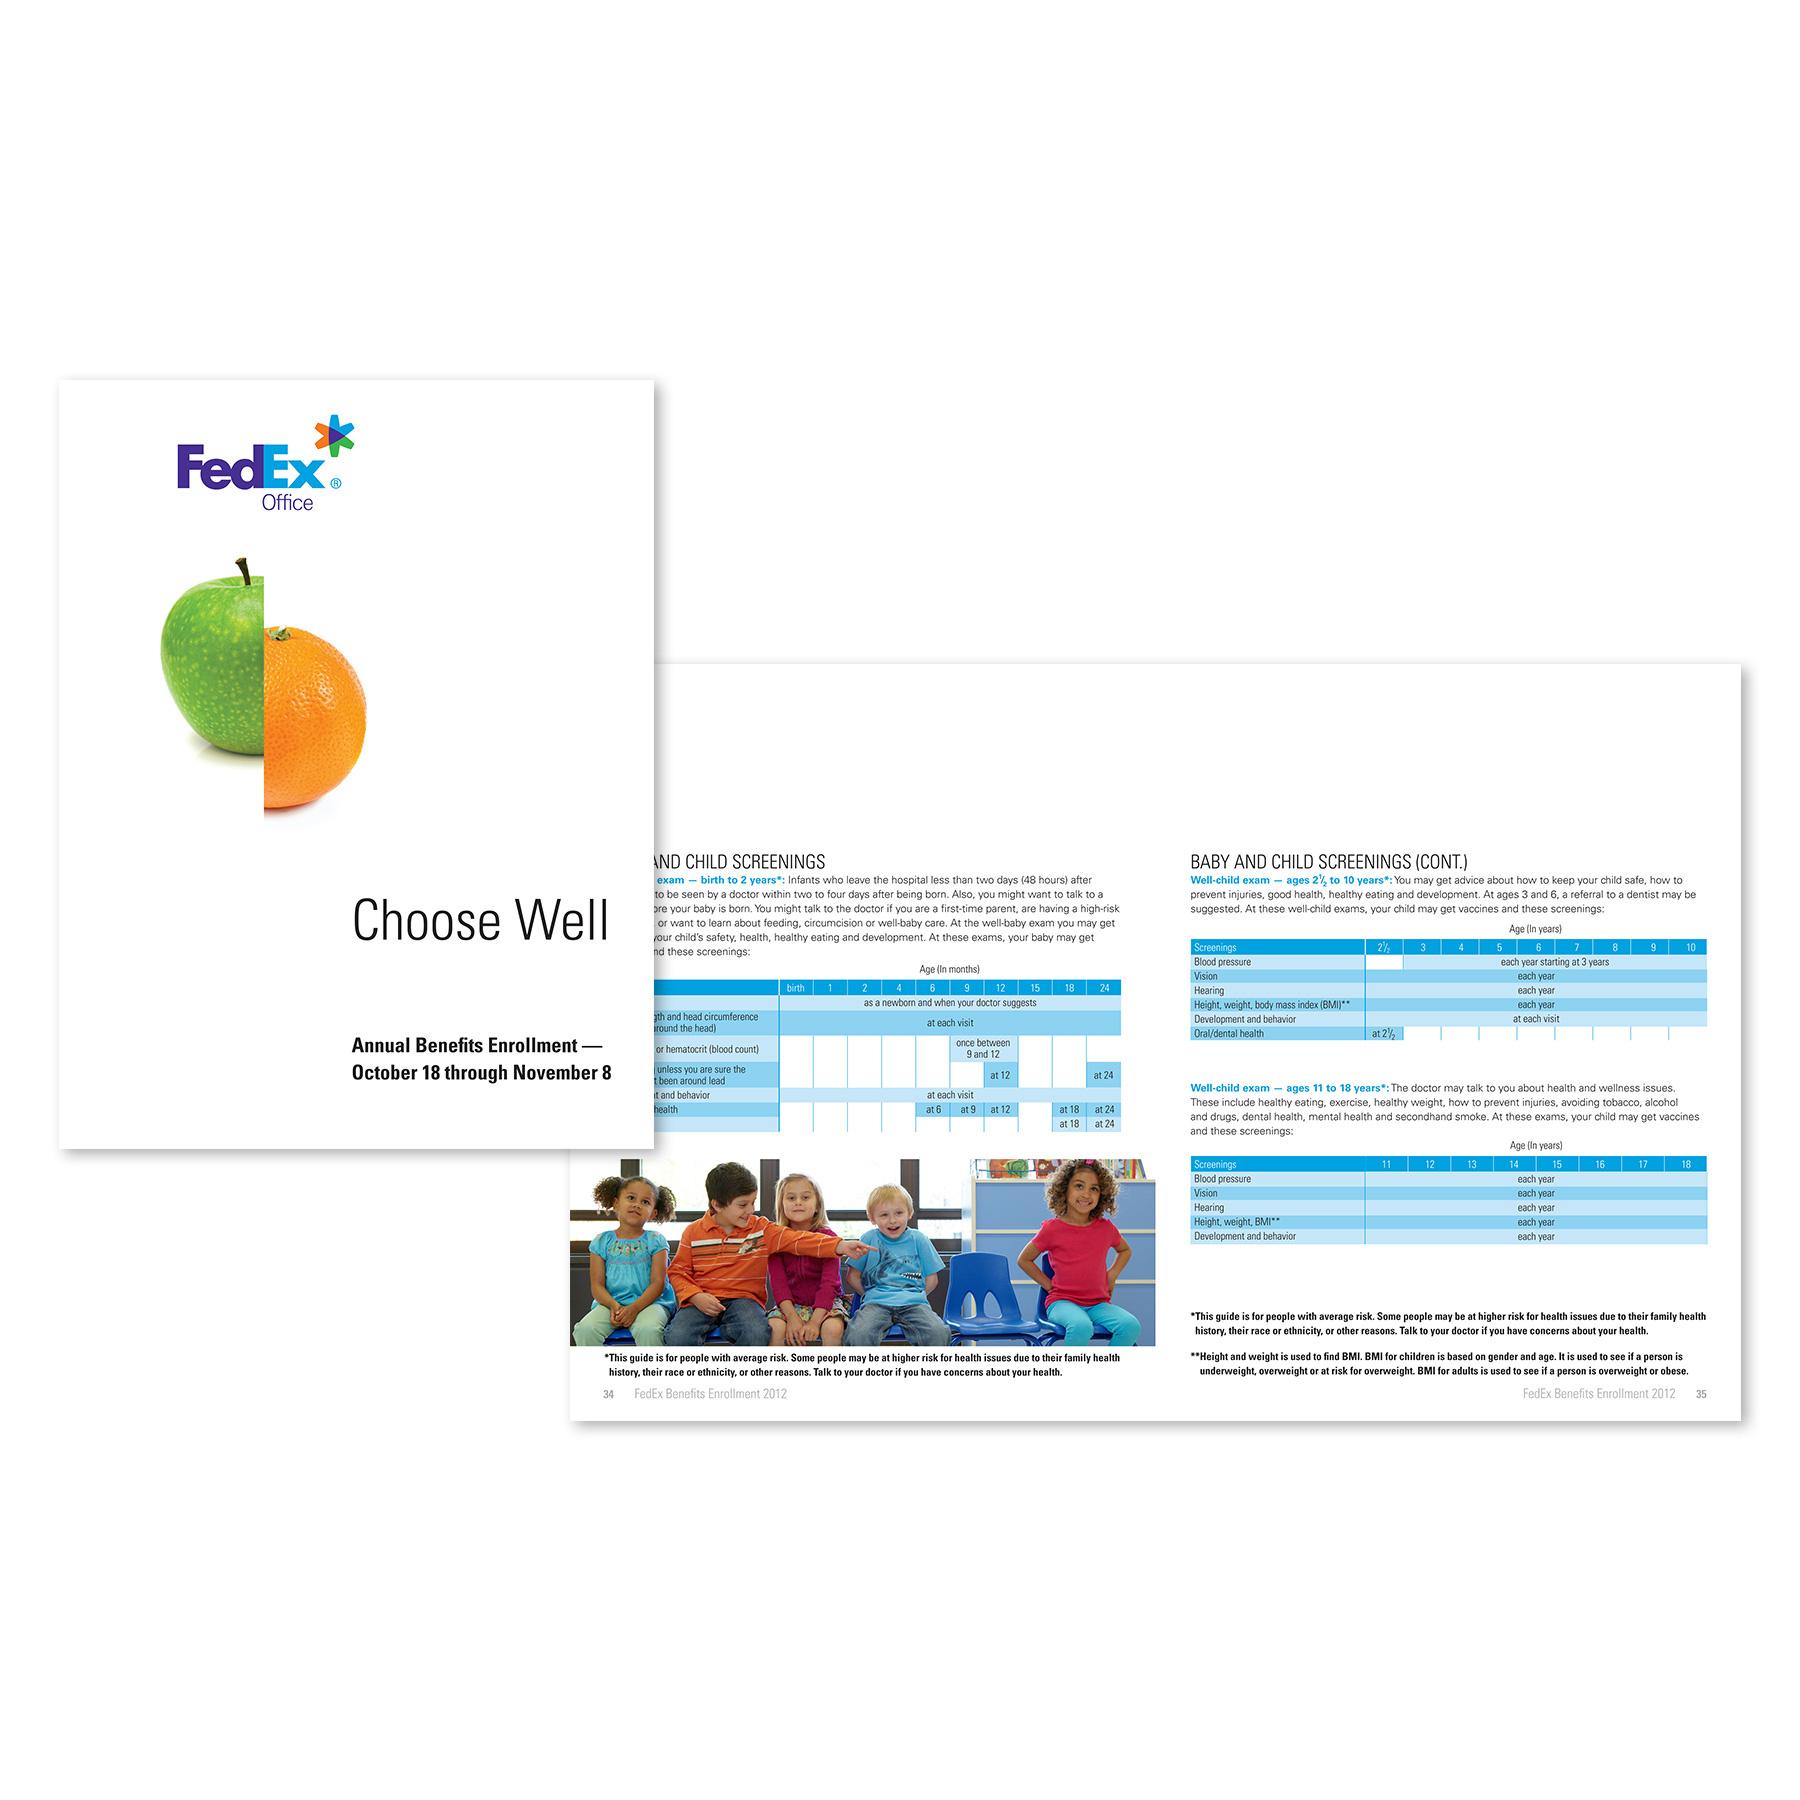 FedEx Open Enrollment Guide